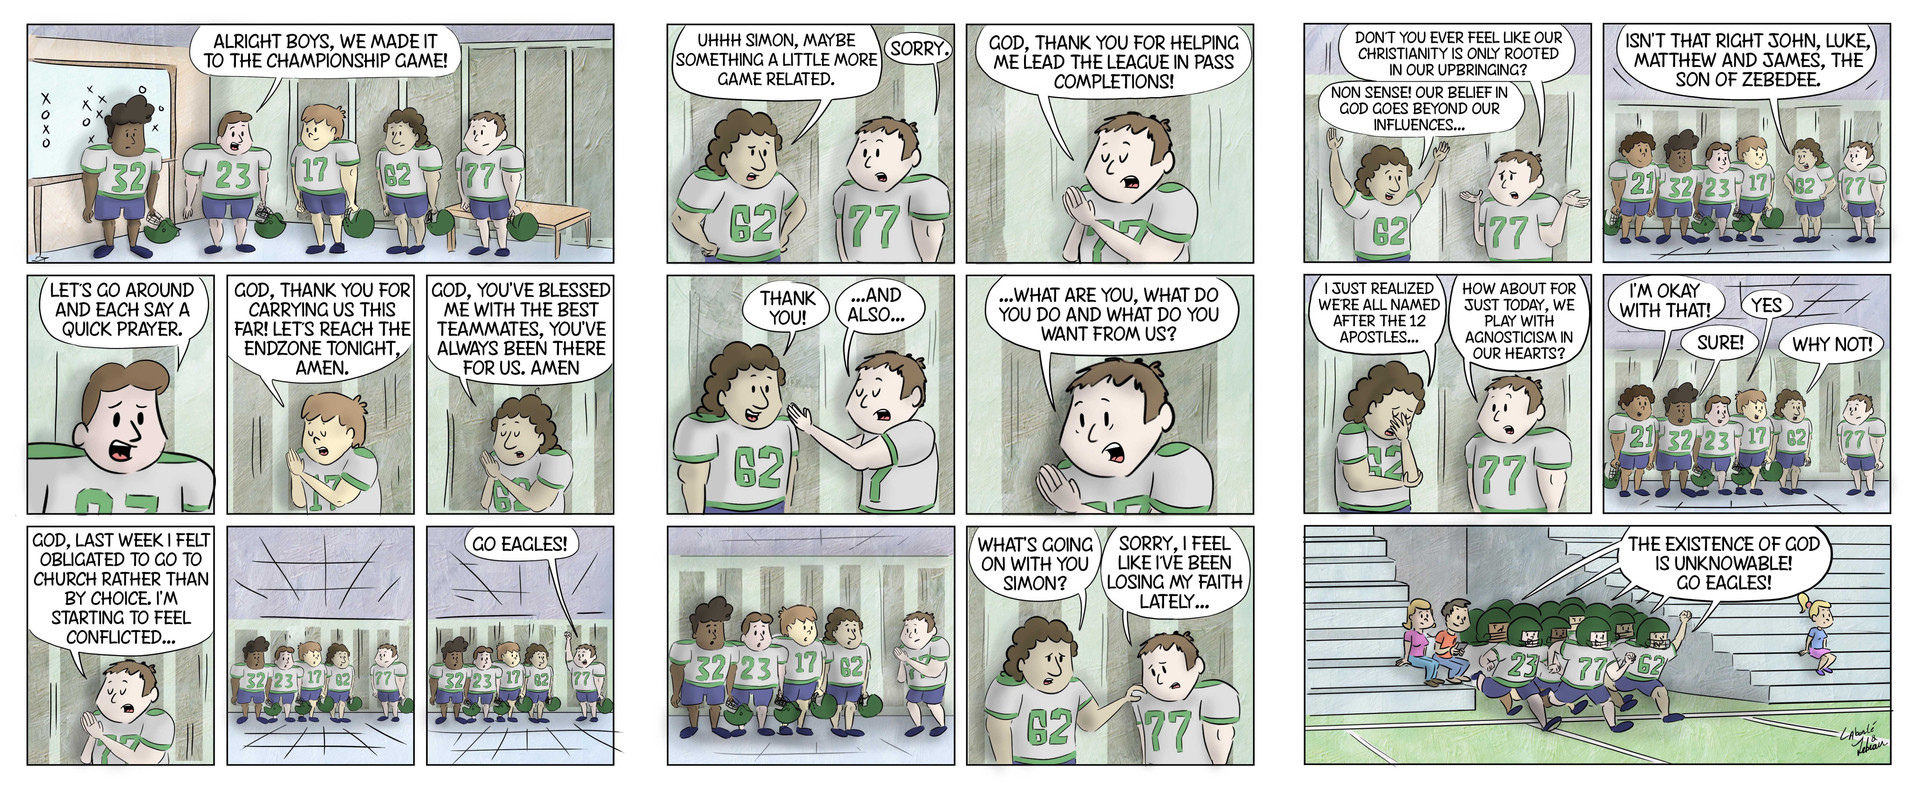 The Football Prayer